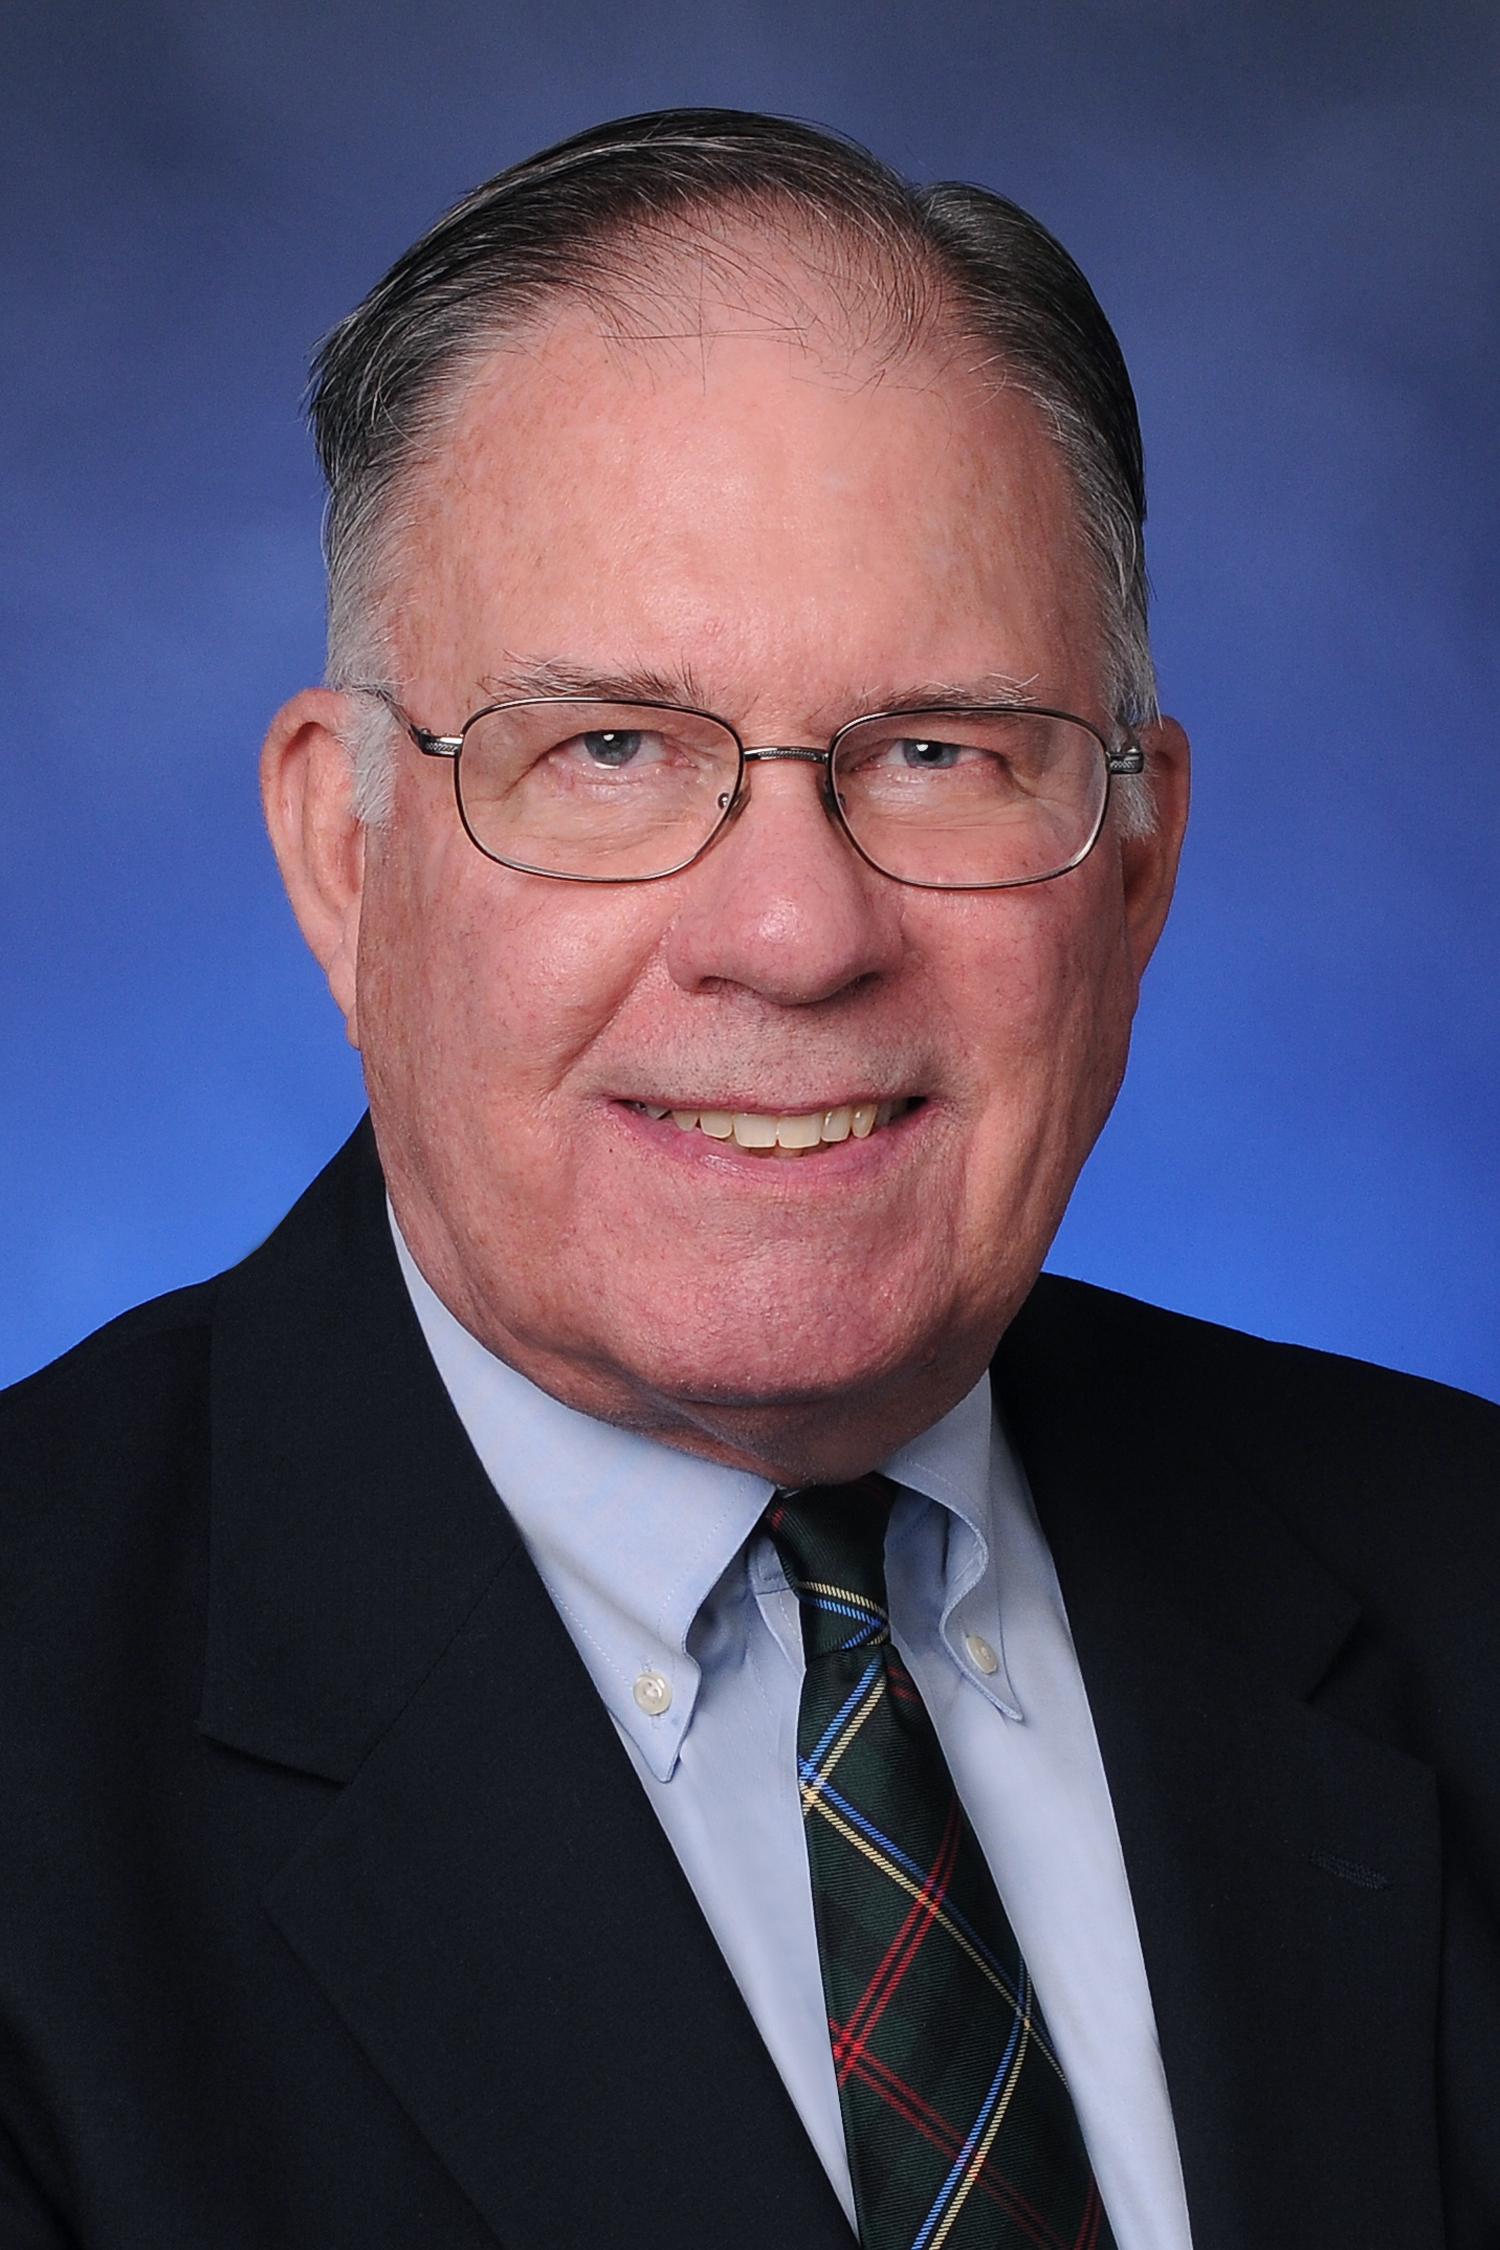 John Gould, Jr., Real Estate Agent - Towson, MD - Coldwell ... John Gould Md